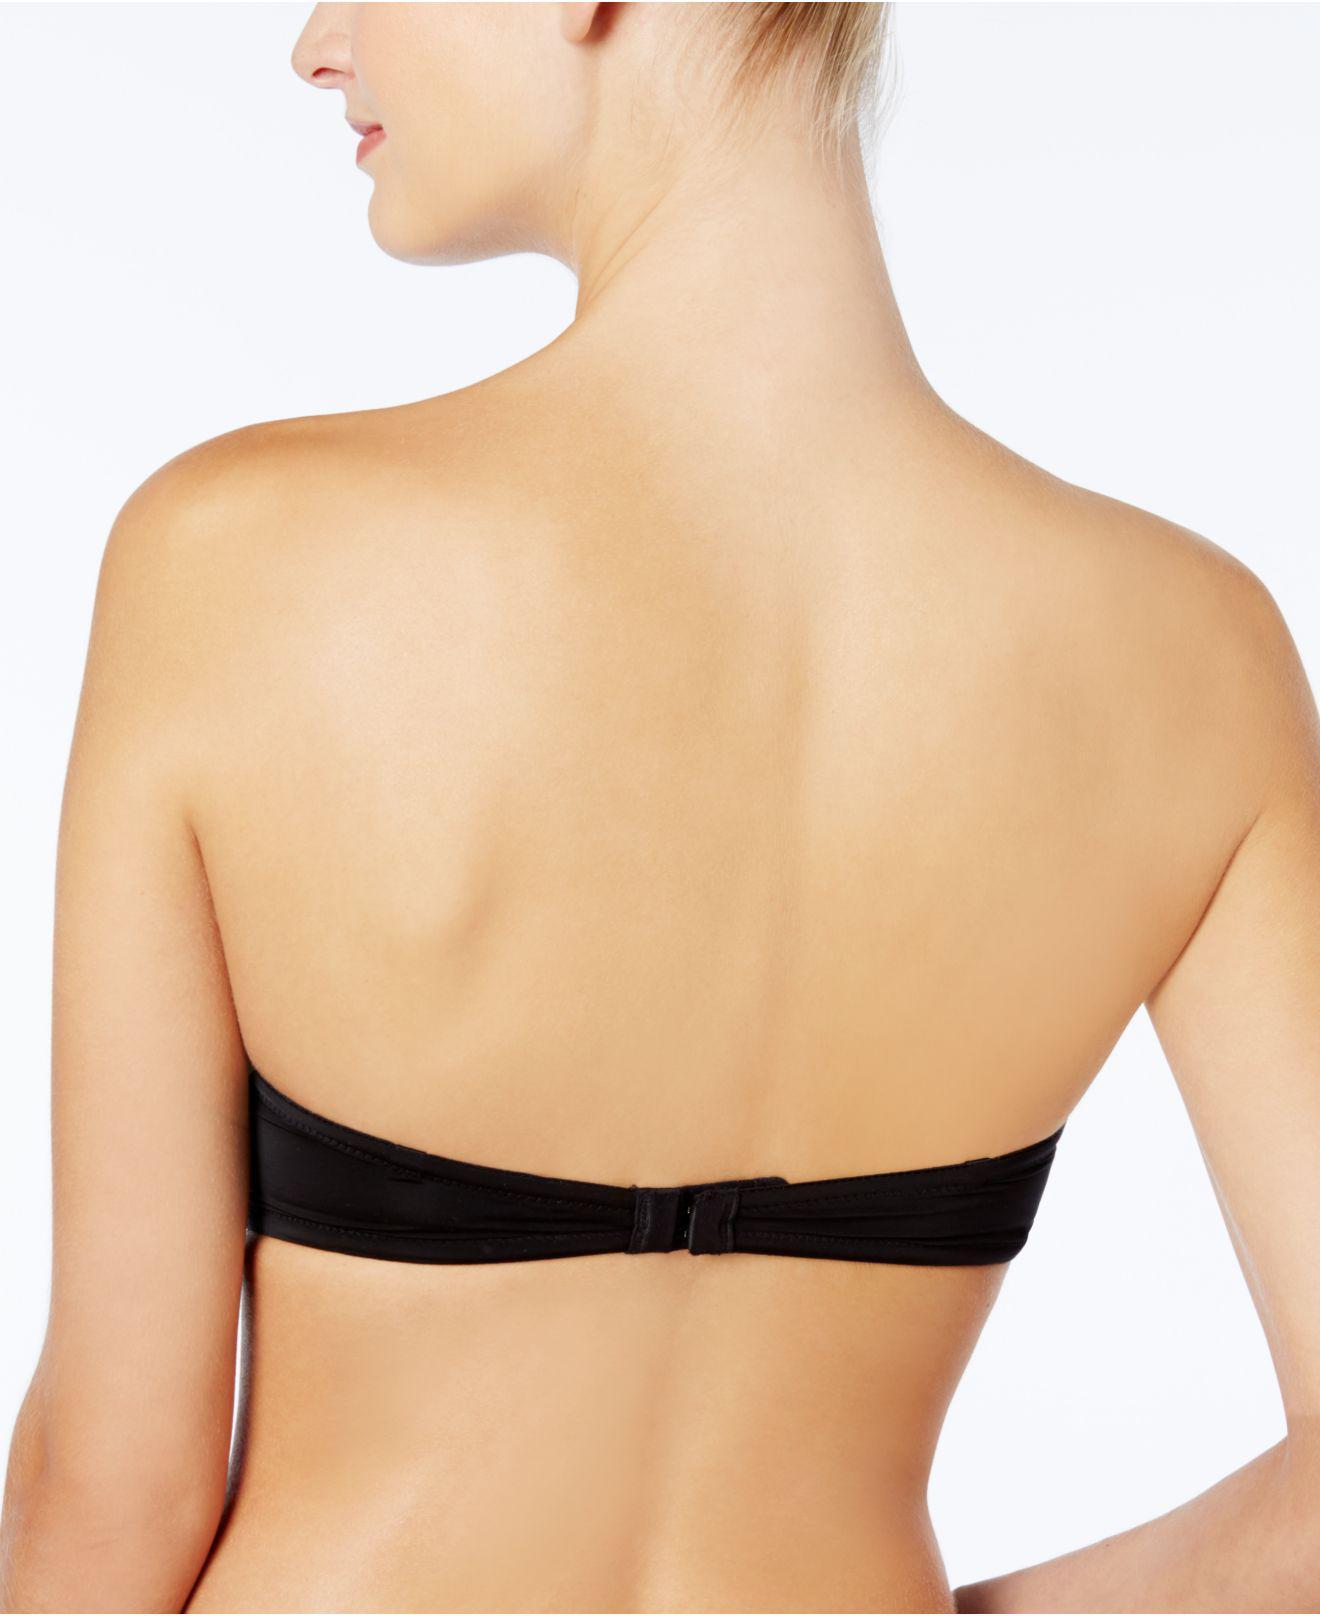 cecc757bfdb87 Lyst - Calvin Klein Naked Glamour Strapless Push Up Bra F3493 in Black